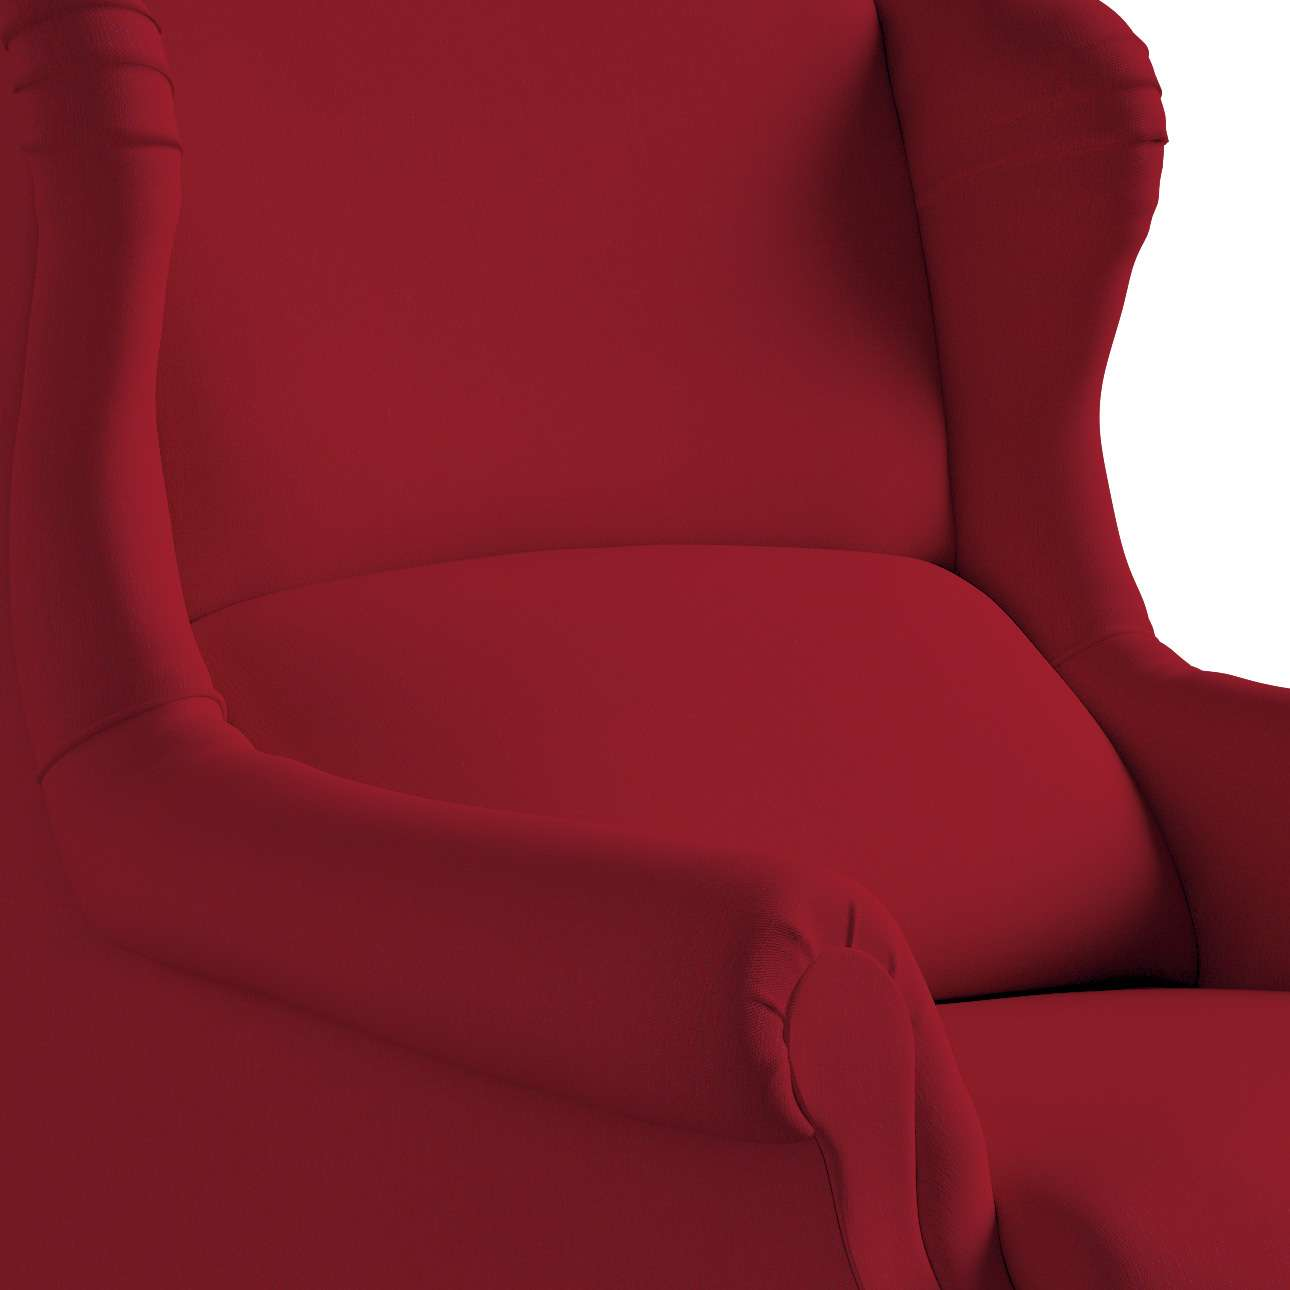 Fotel Unique w kolekcji Chenille, tkanina: 702-24